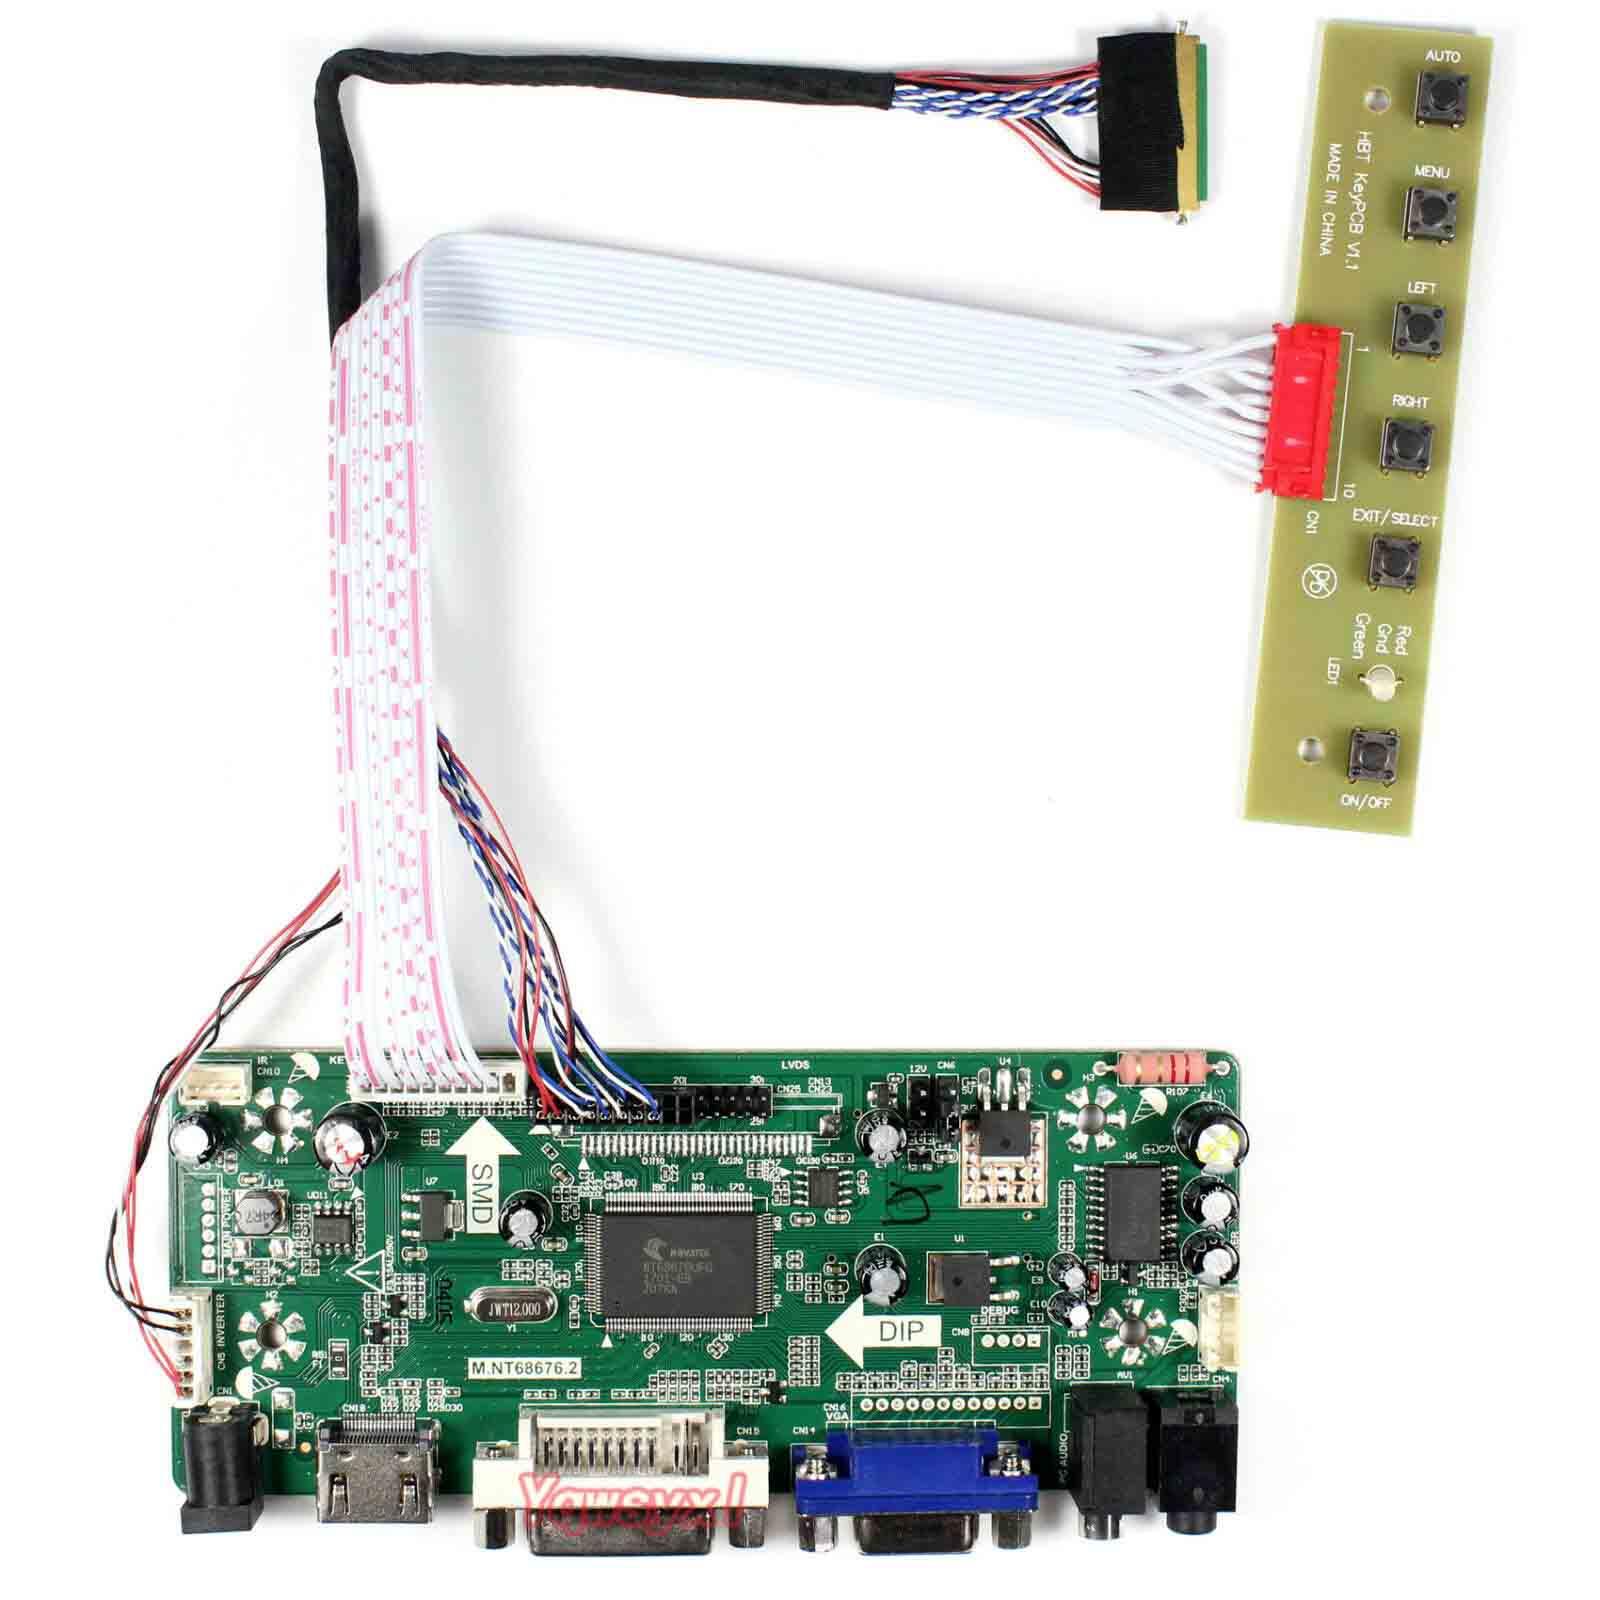 Yqwsyxl Control Board Monitor Kit For N140BGE-L33  N140BGE-L42  N140BGE-LB3  HDMI+DVI+VGA LCD LED Screen Controller Board Driver